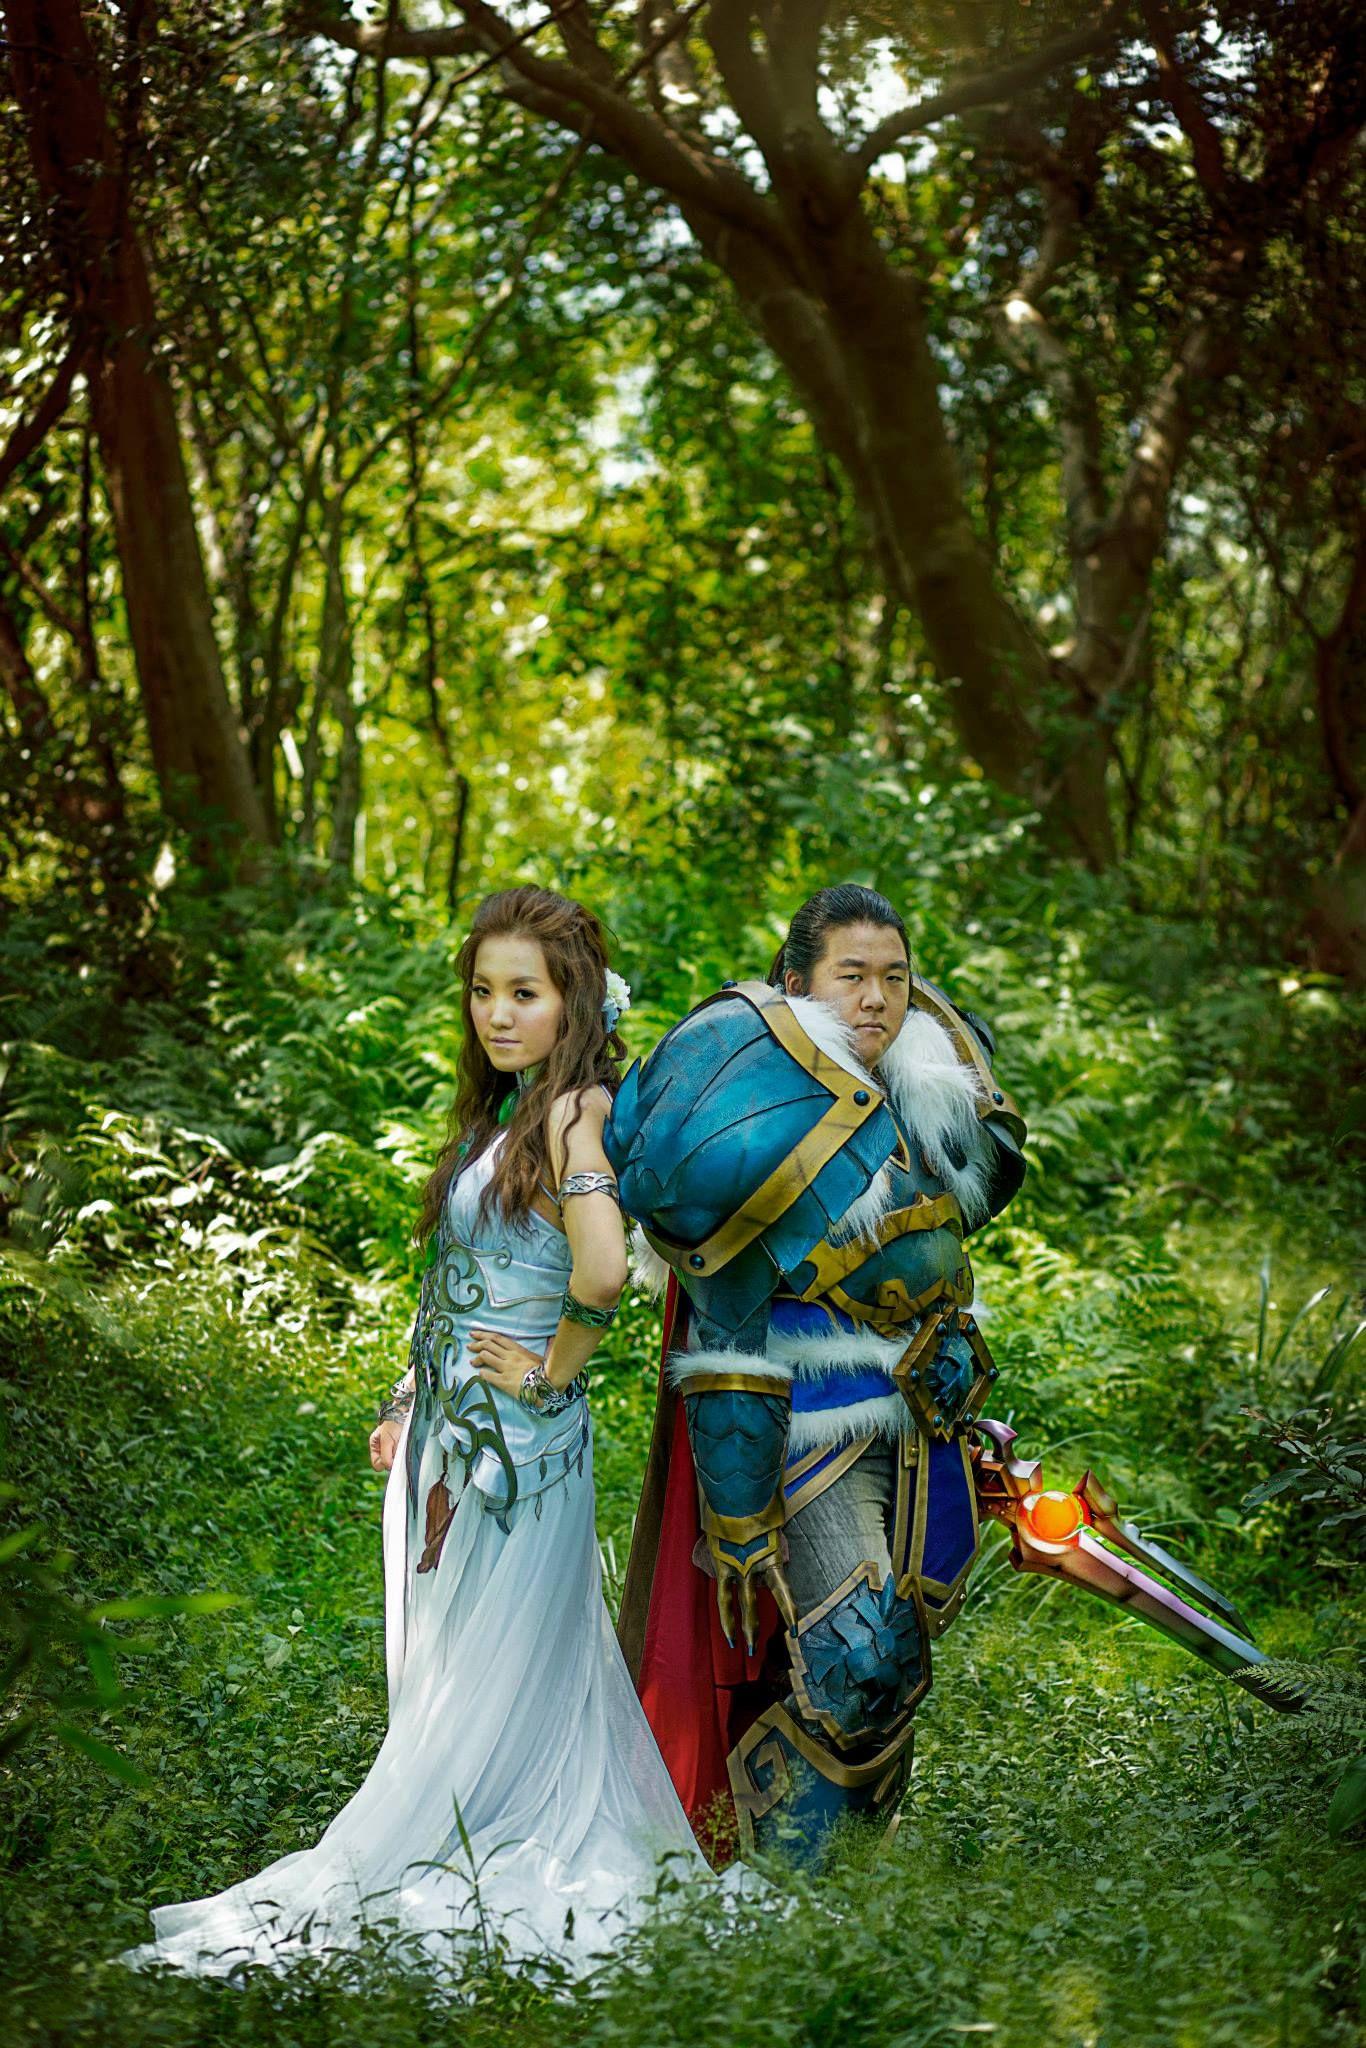 World Of Warcraft Cosplay Wedding World Of Warcraft Warcraft The Incredibles